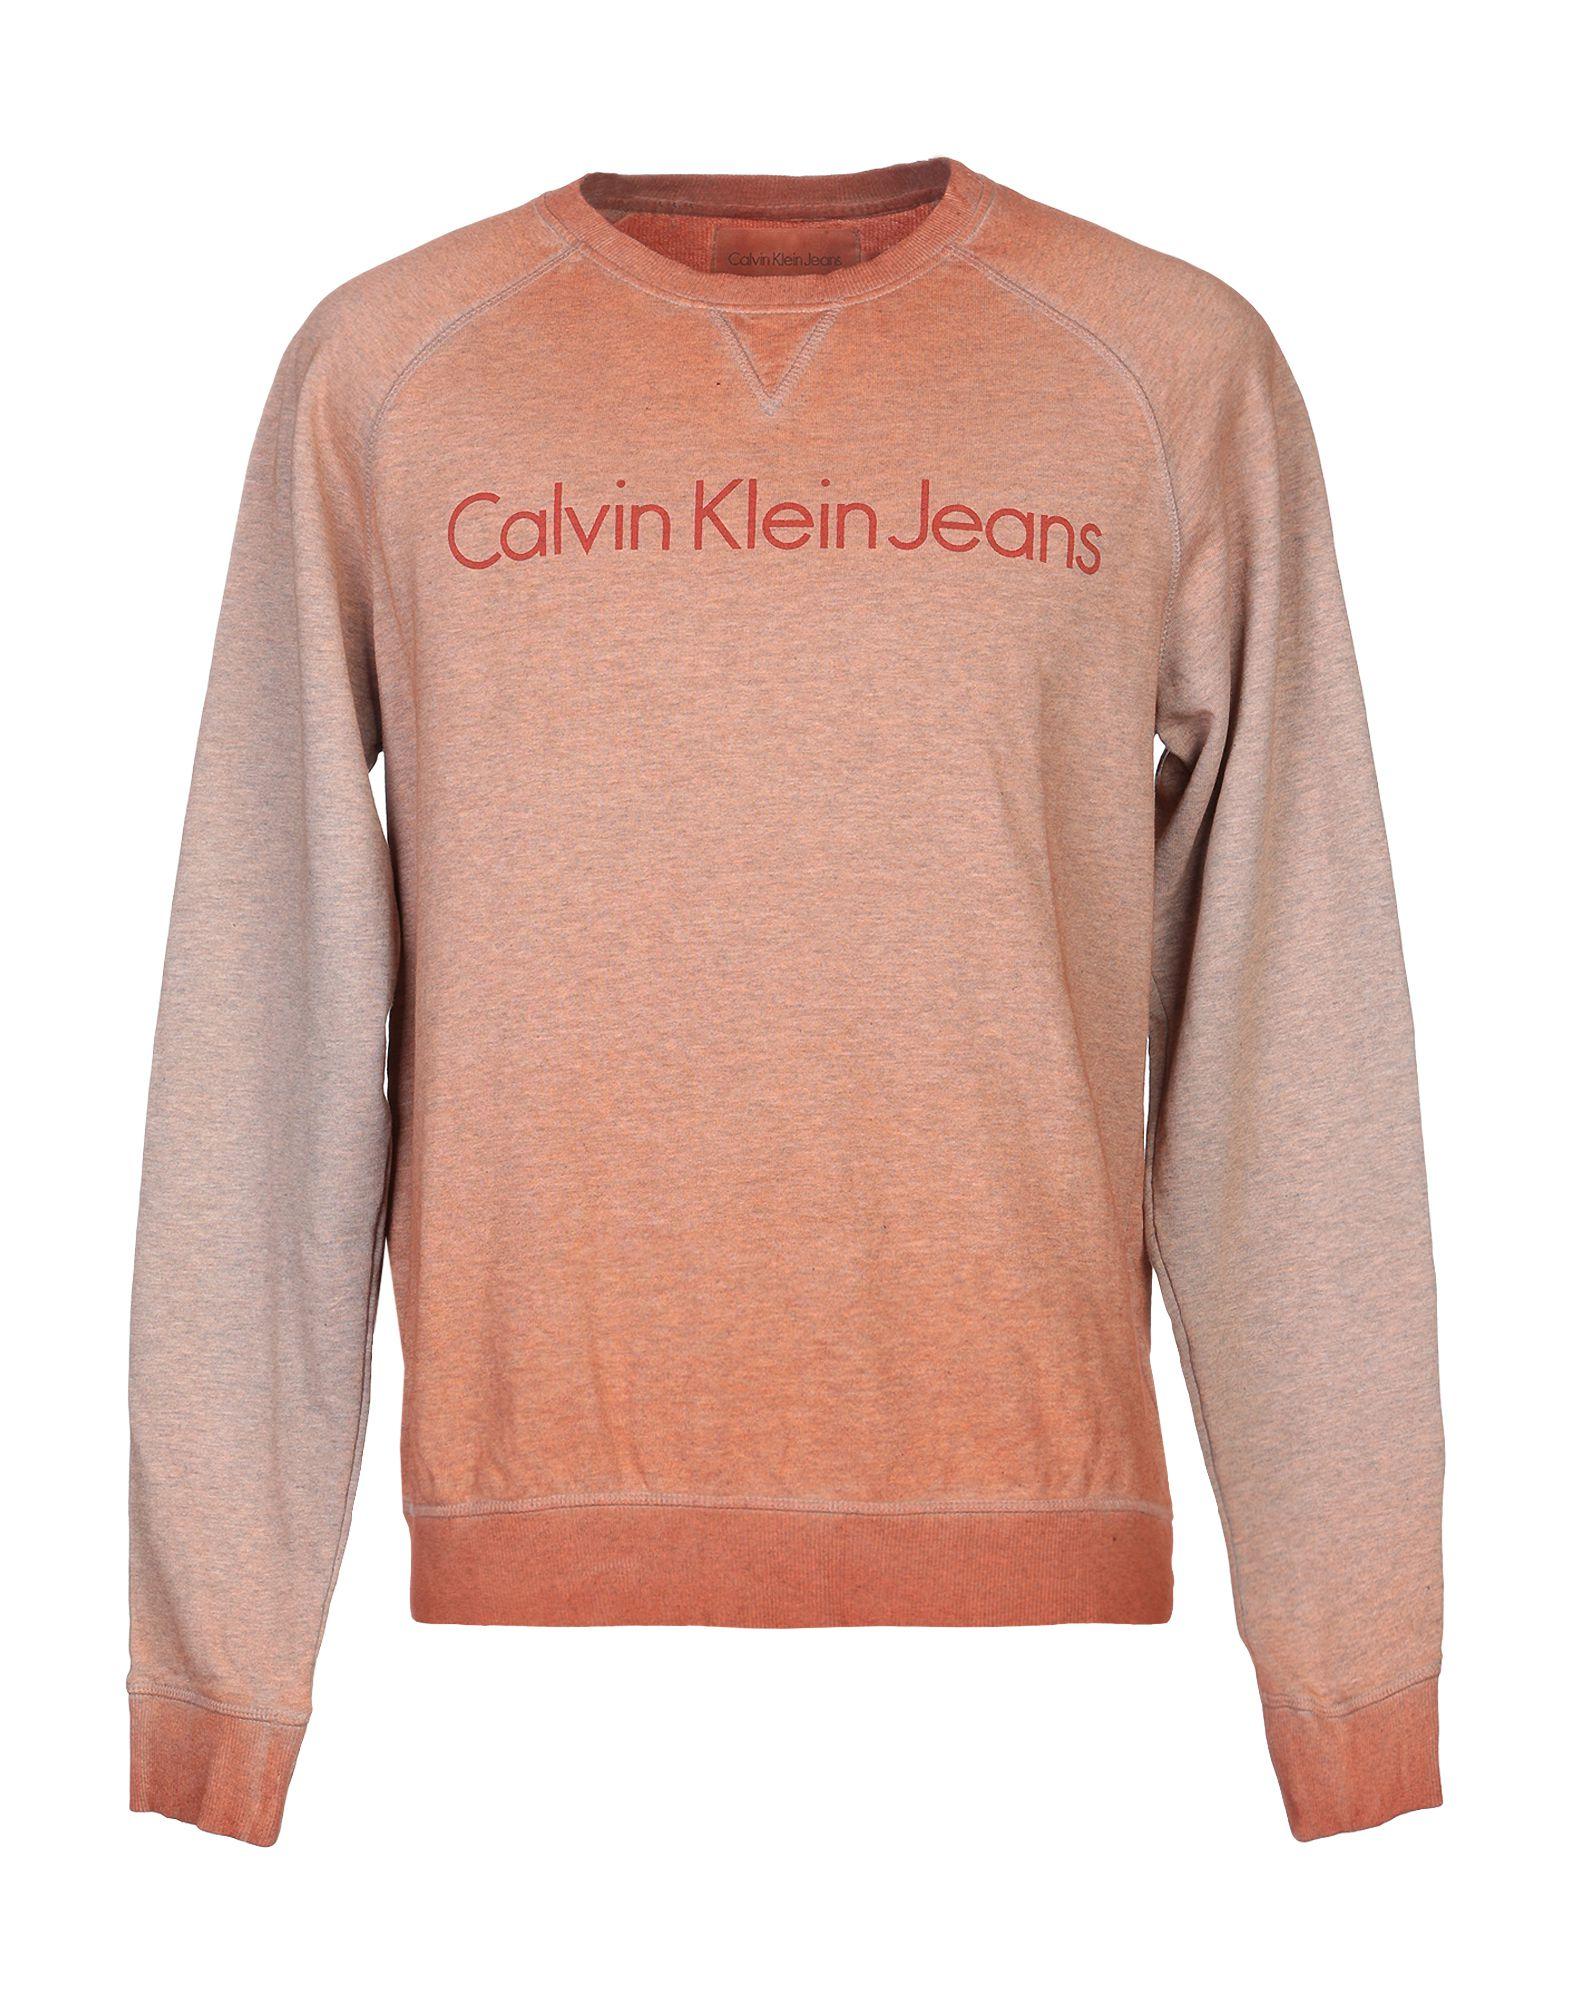 CALVIN KLEIN JEANS Толстовка calvin klein jeans толстовка